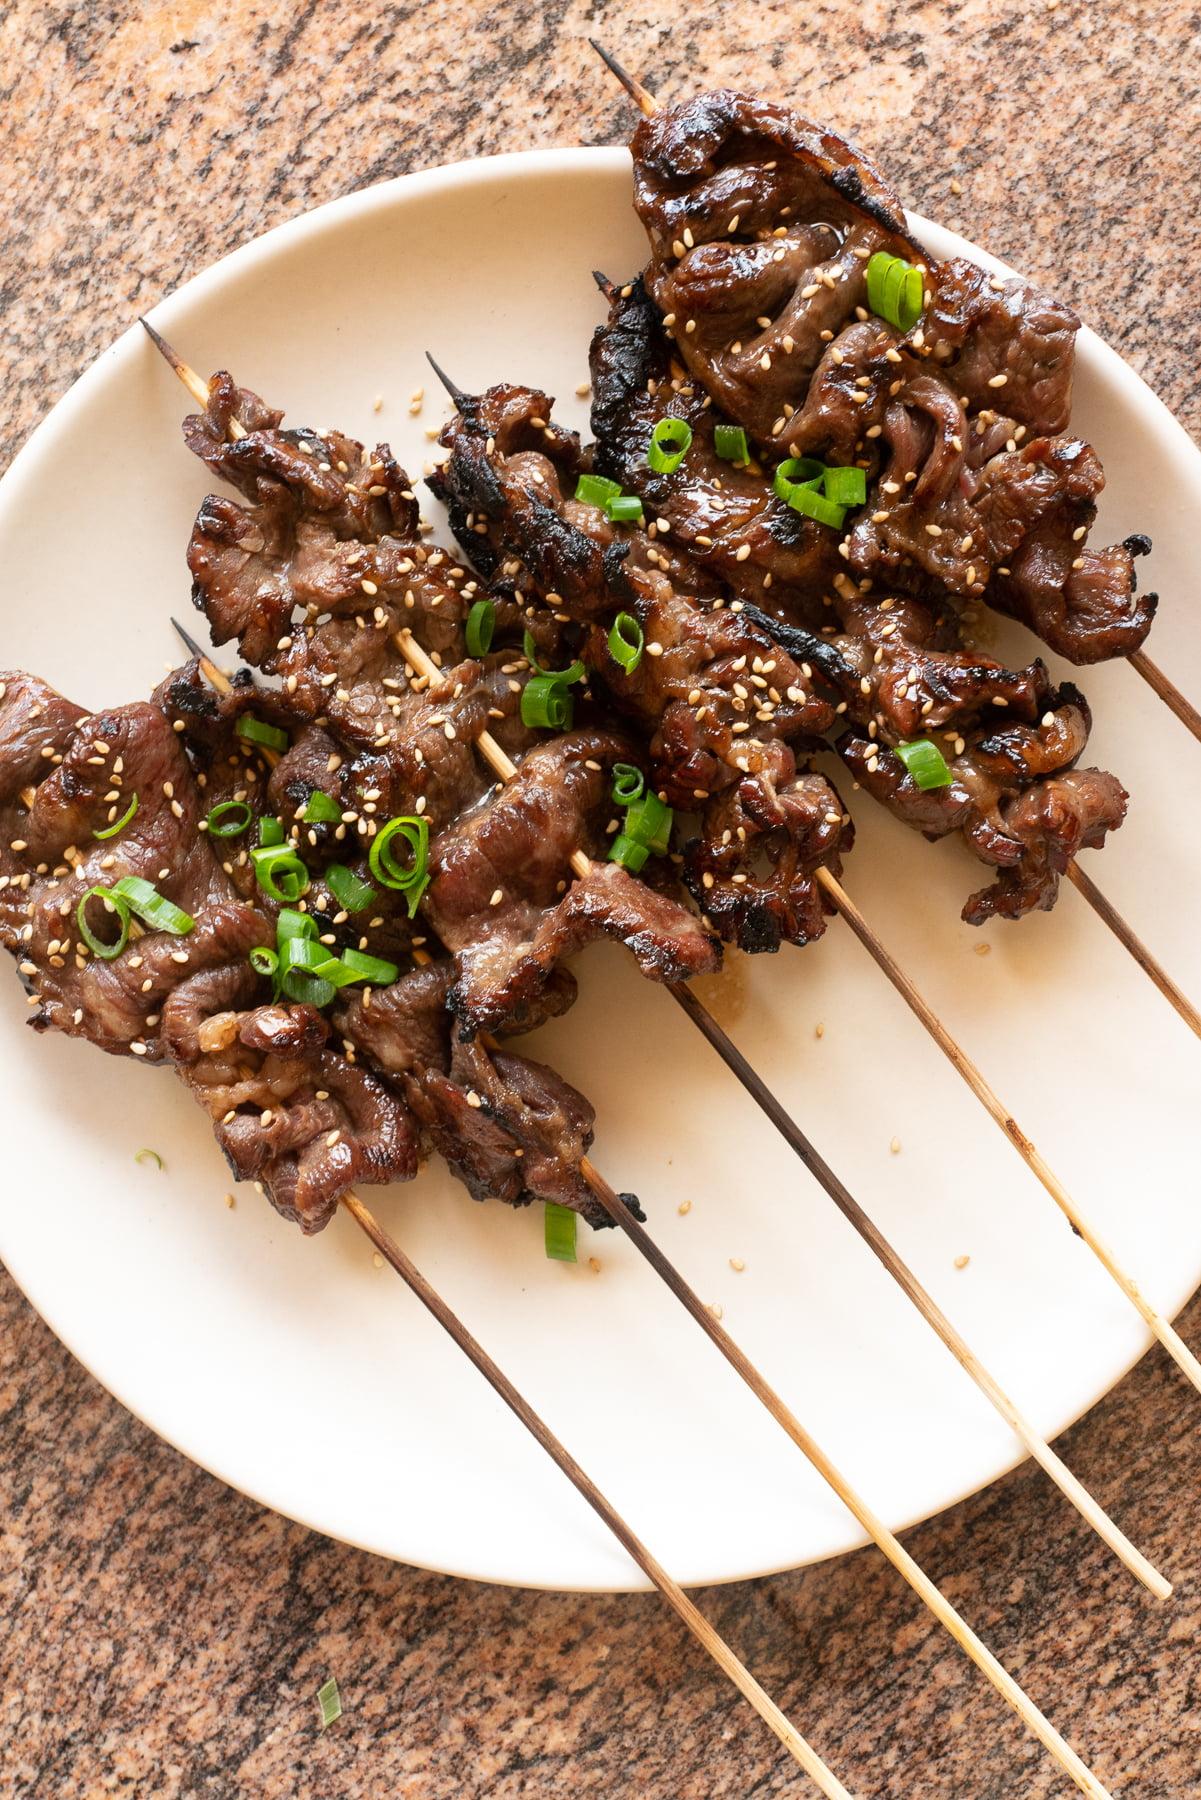 Beef Teriyaki Sticks on a plate.